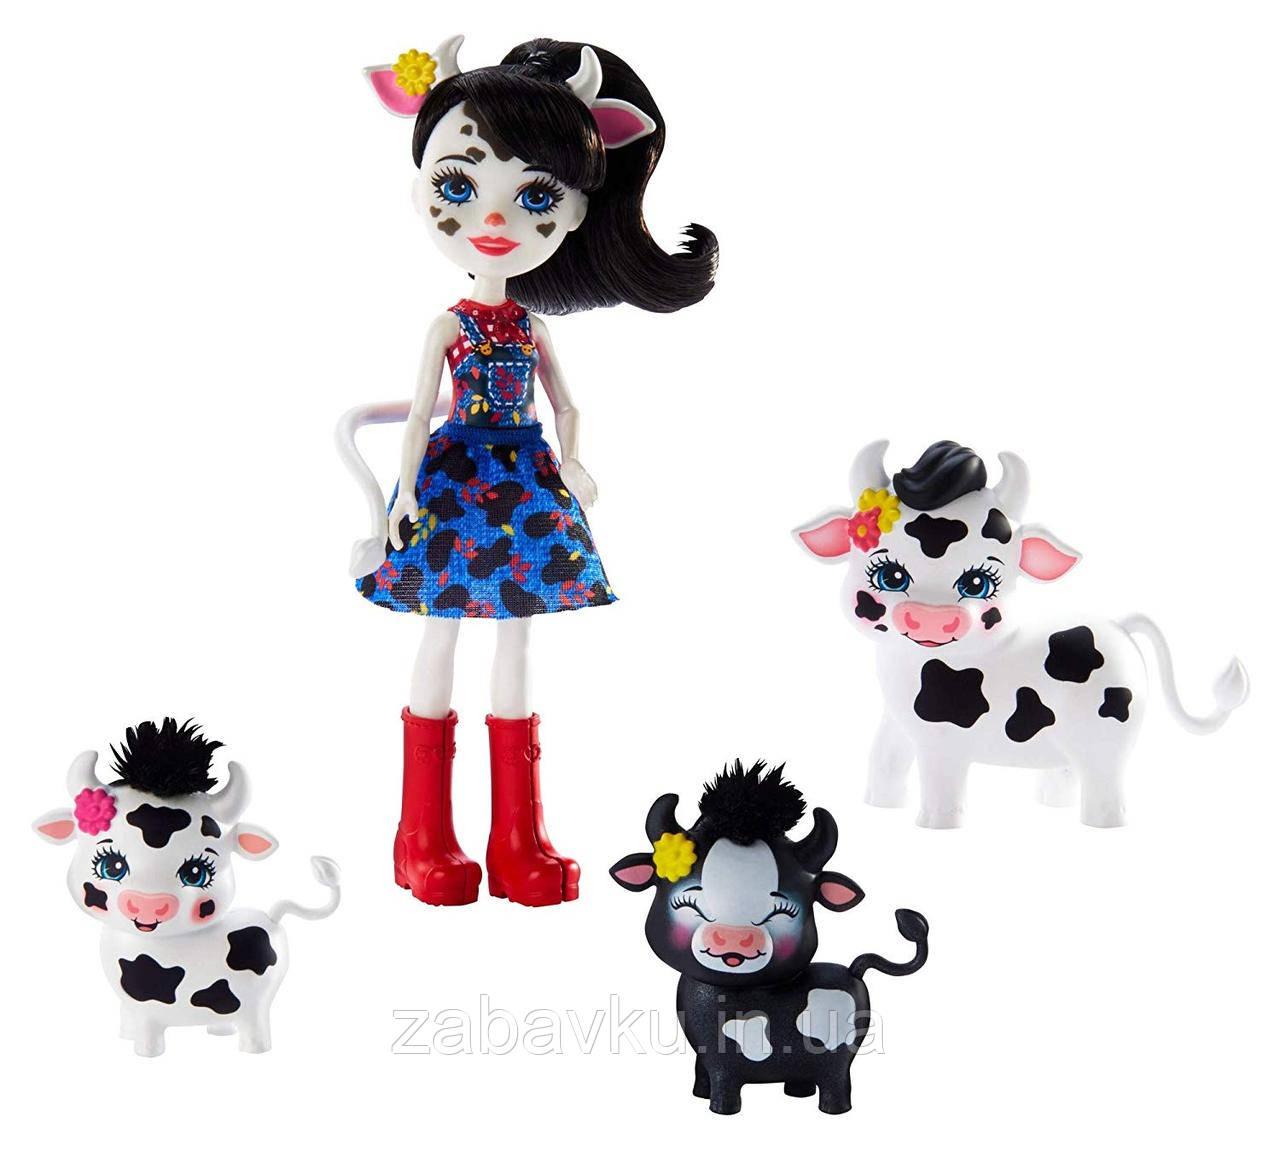 Енчантімалс набір Коровка Enchantimals Cambrie Cow Doll with Ricotta Cow